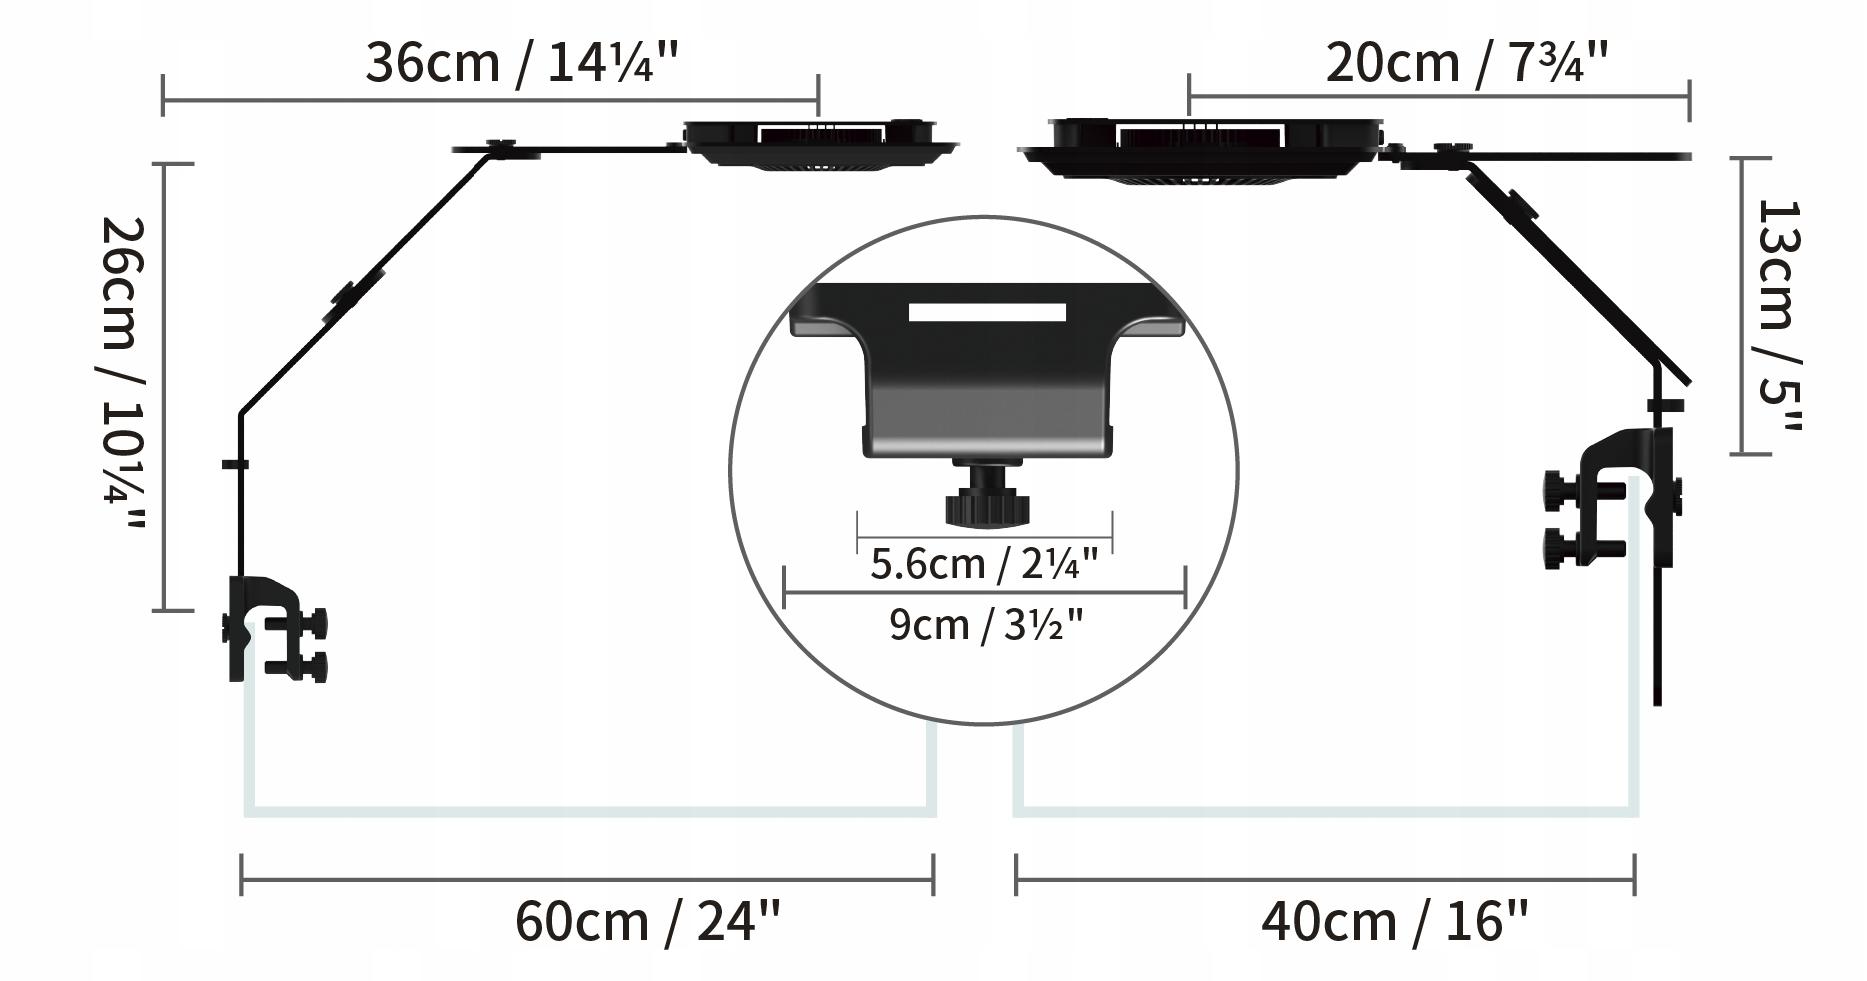 Maxspect Jump Light LED MJ-L165 lampa Syna-G Cloud Waga (z opakowaniem) 2.25 kg